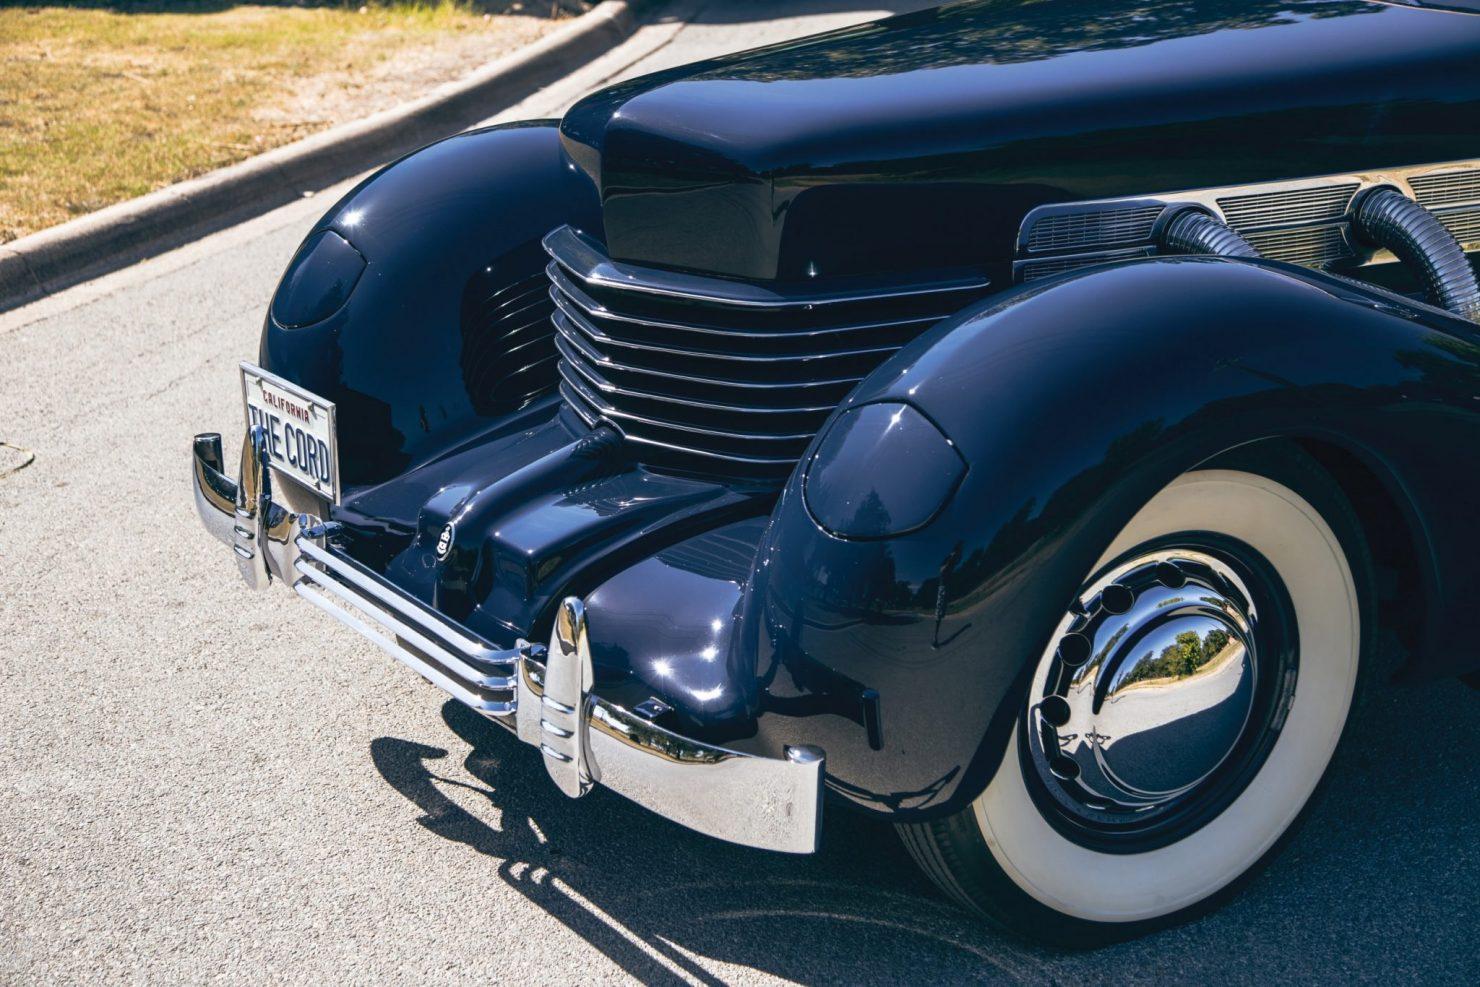 cord 812 supercharged phaeton 6 1480x987 - 1937 Cord 812 Supercharged Phaeton